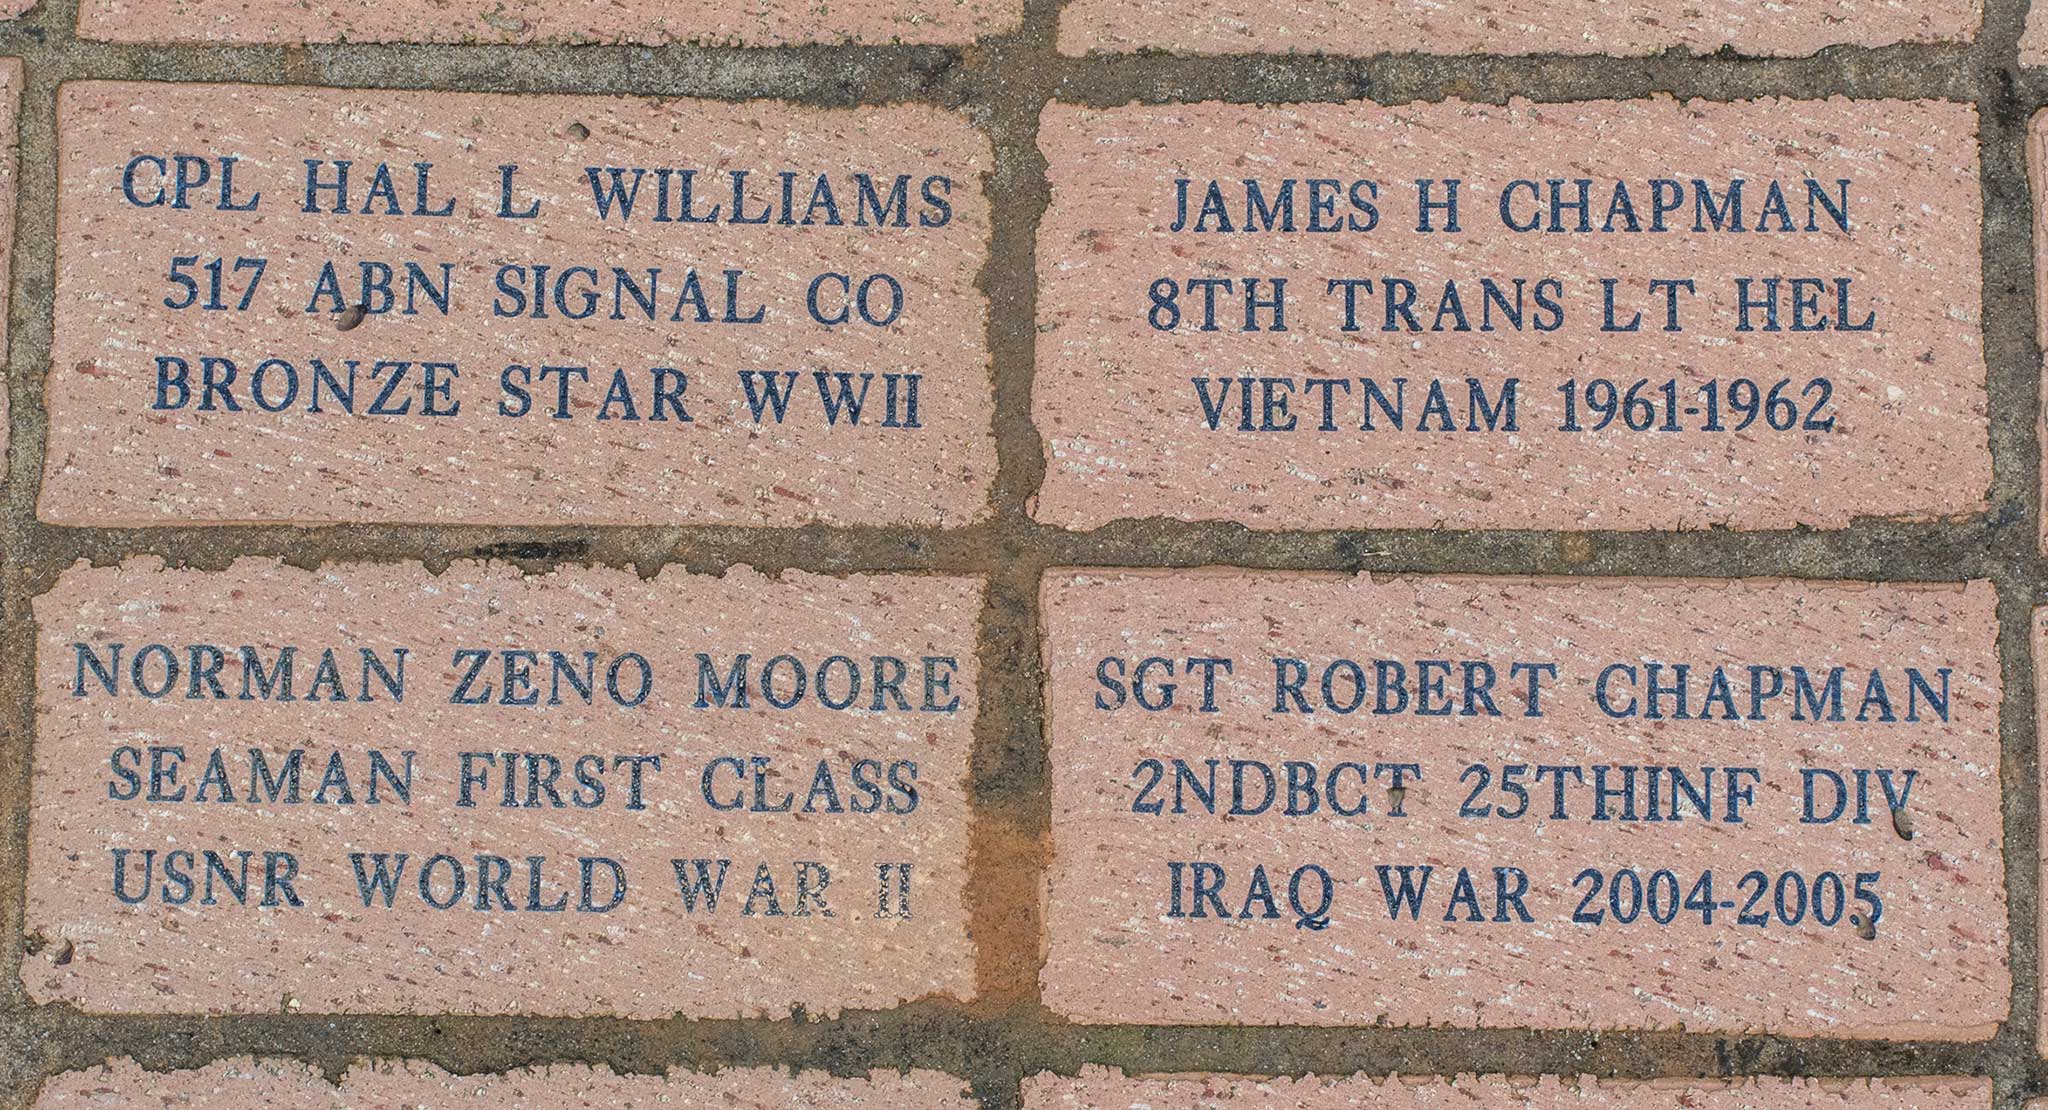 CPL HAL L WILLIAMS 517 ABN SIGNAL CO BRONZE STAR WWII